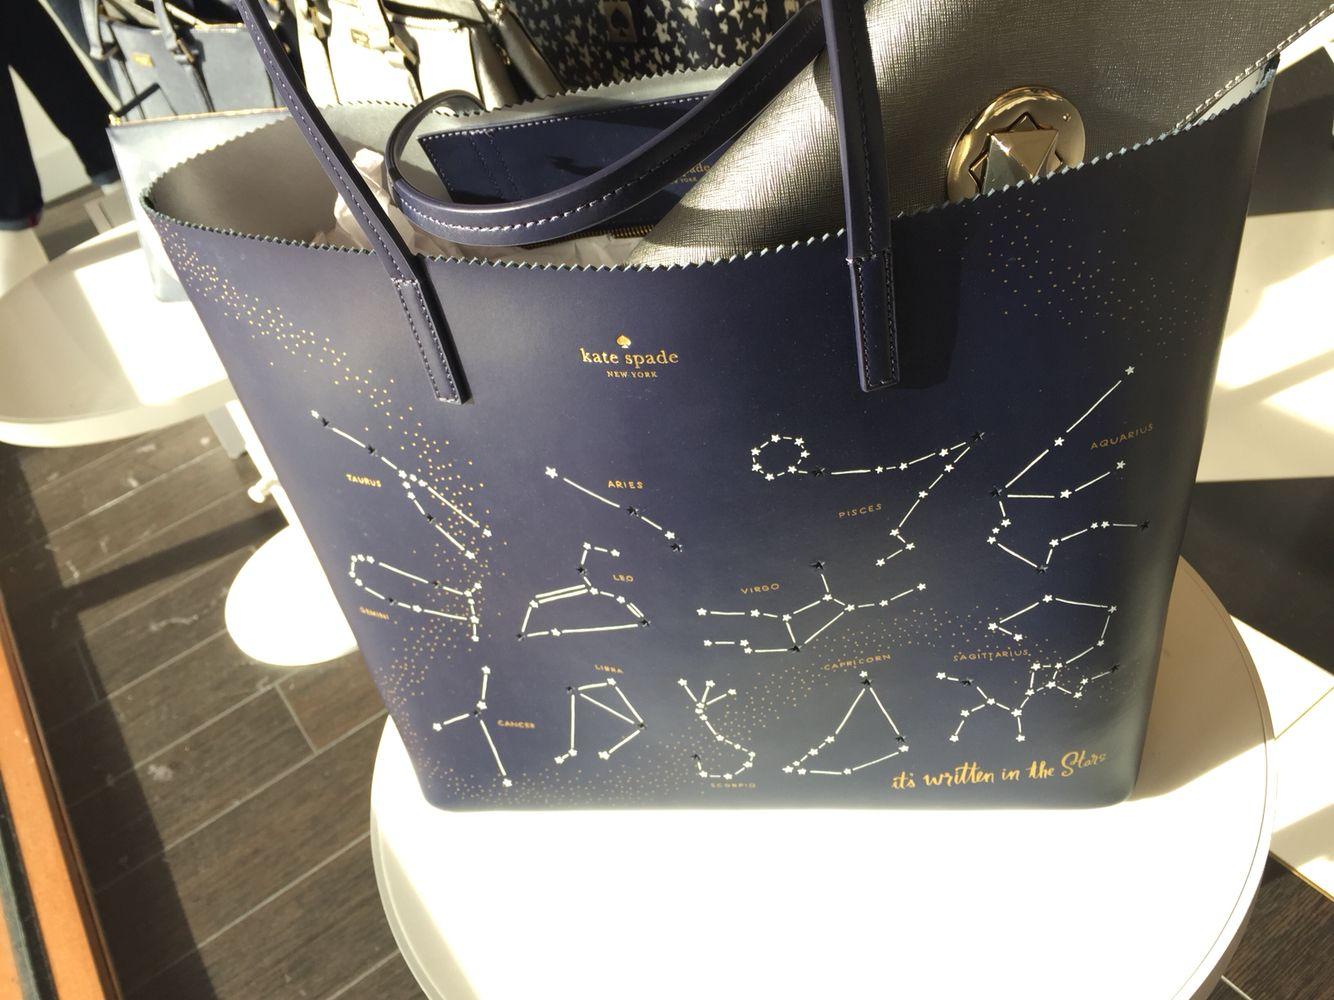 Kate spade constellation tote